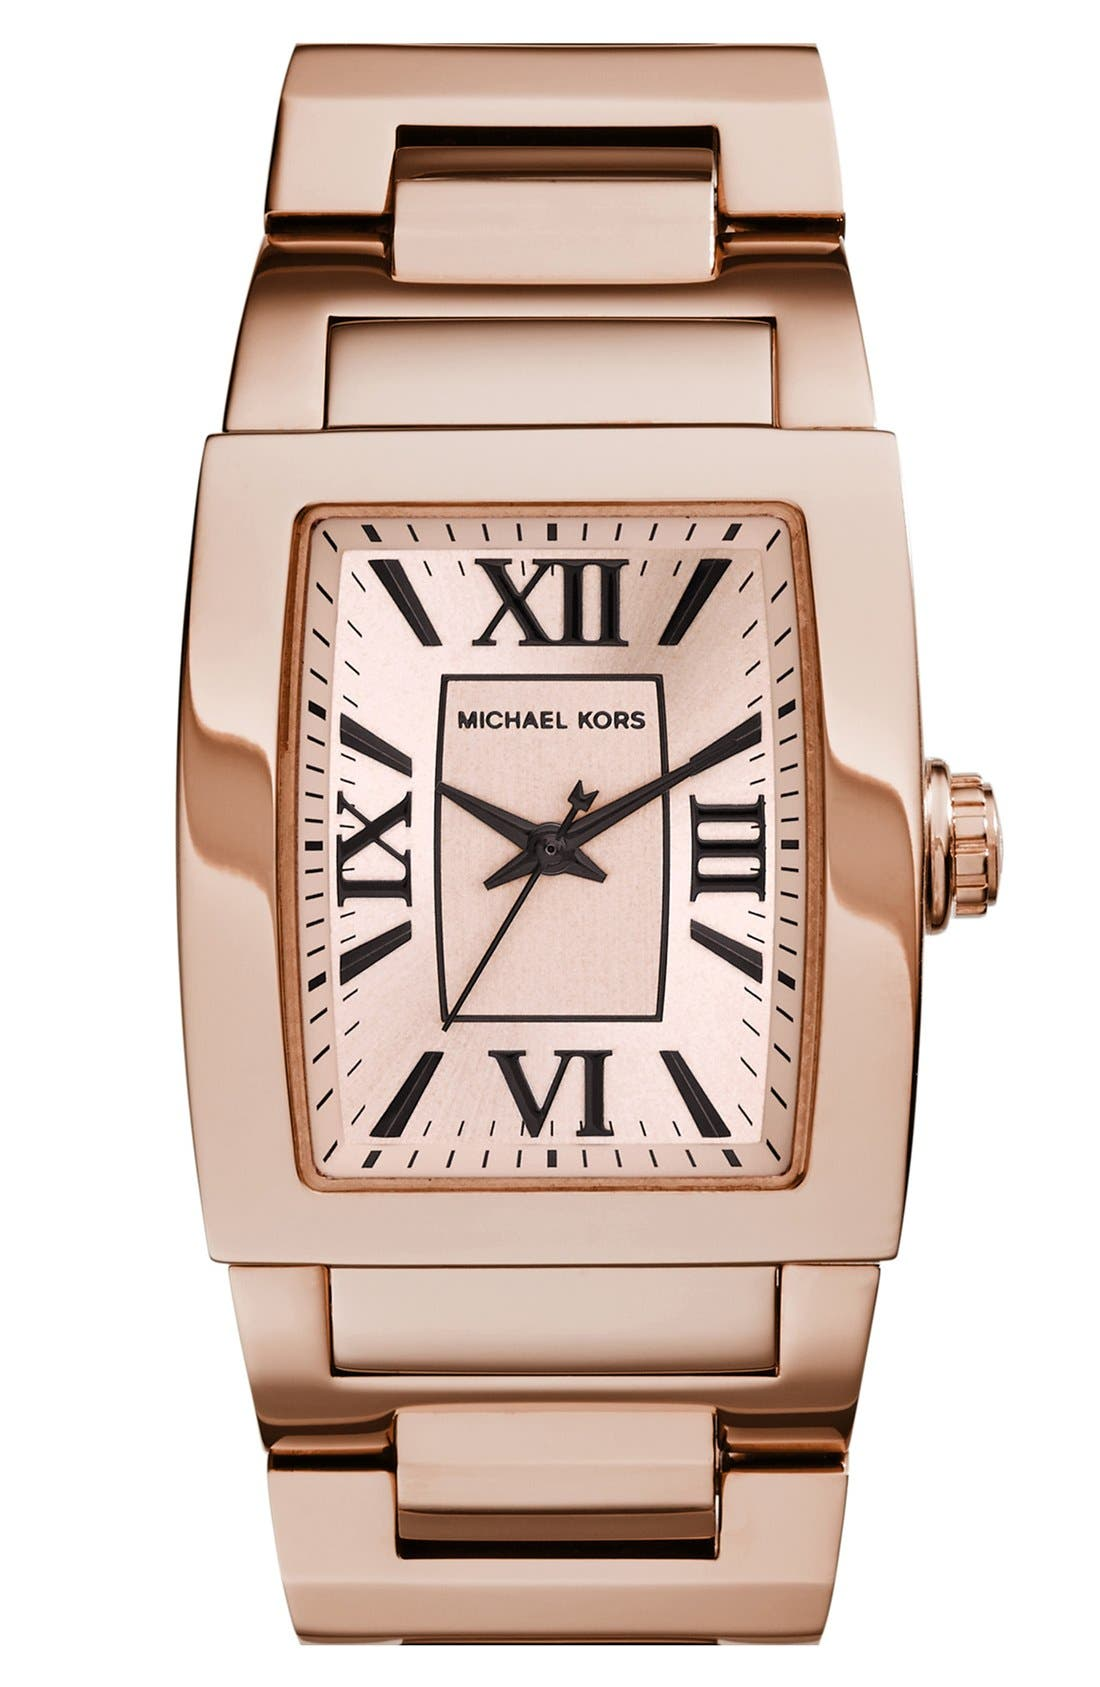 Main Image - Michael Kors 'Denali' Barrel Case Bracelet Watch, 38mm